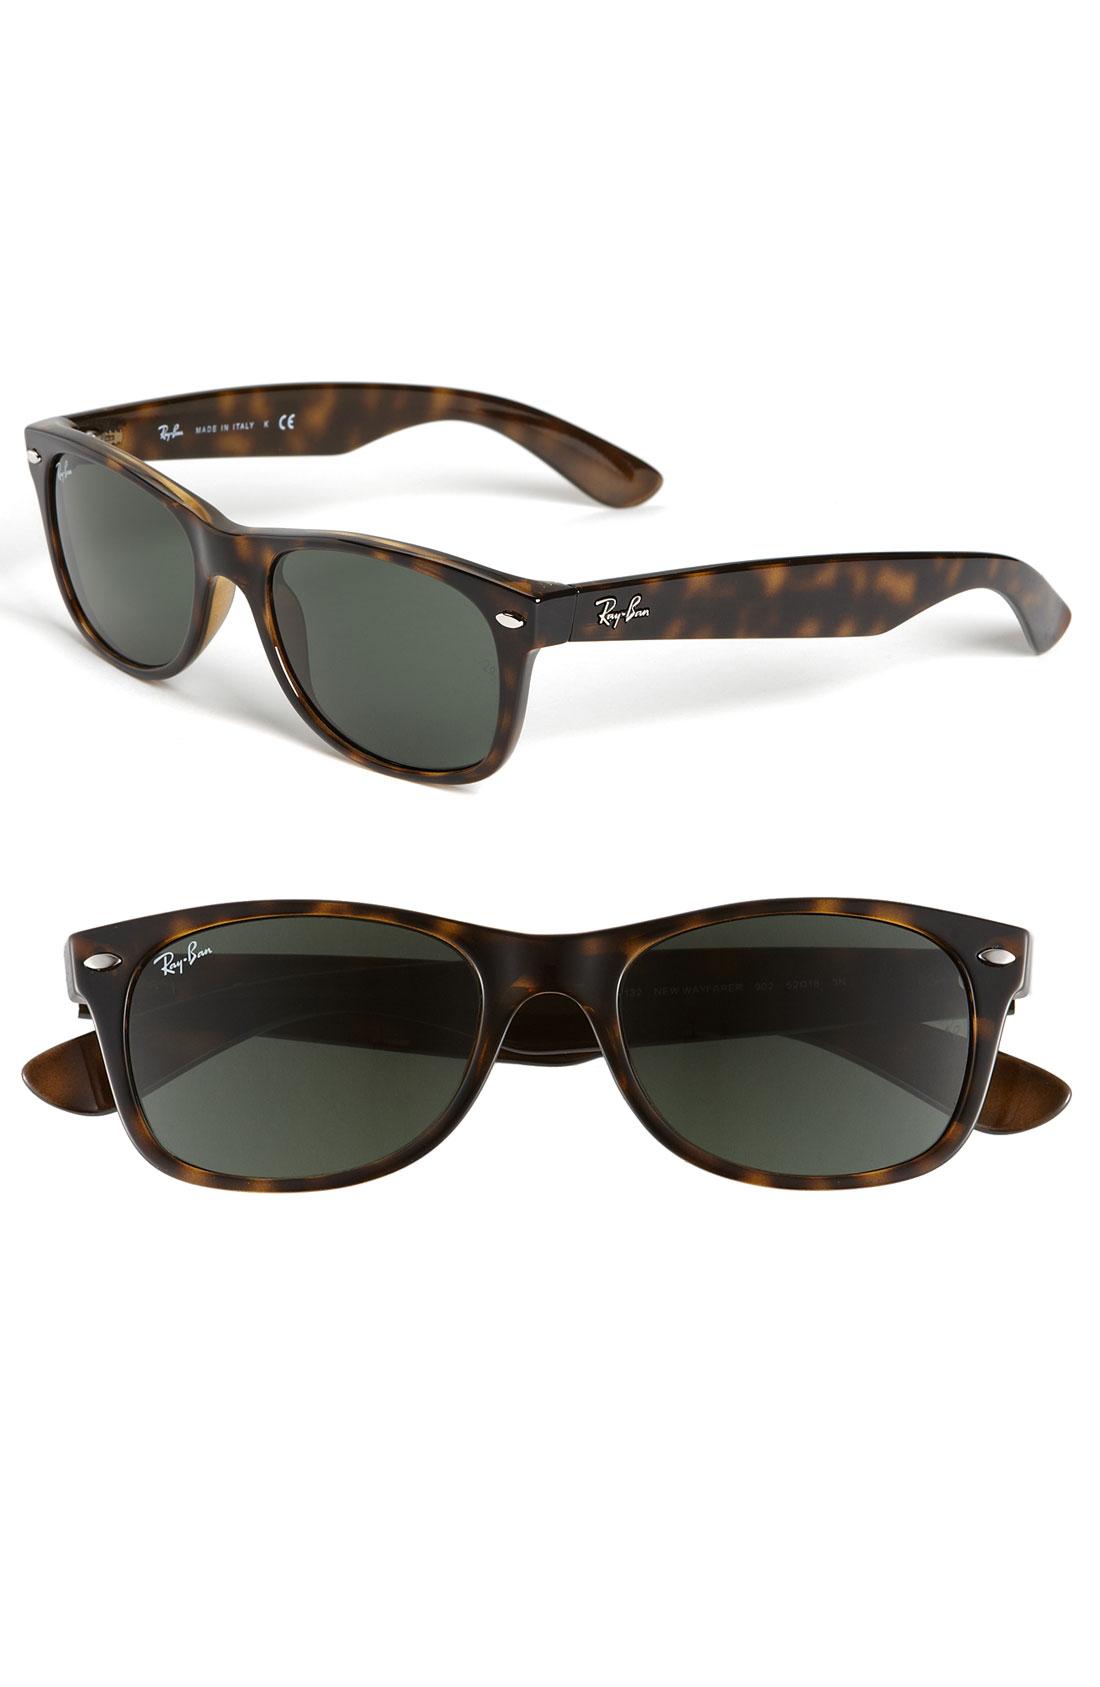 Ray-ban 'New Small Wayfarer' 52Mm Sunglasses - Dark